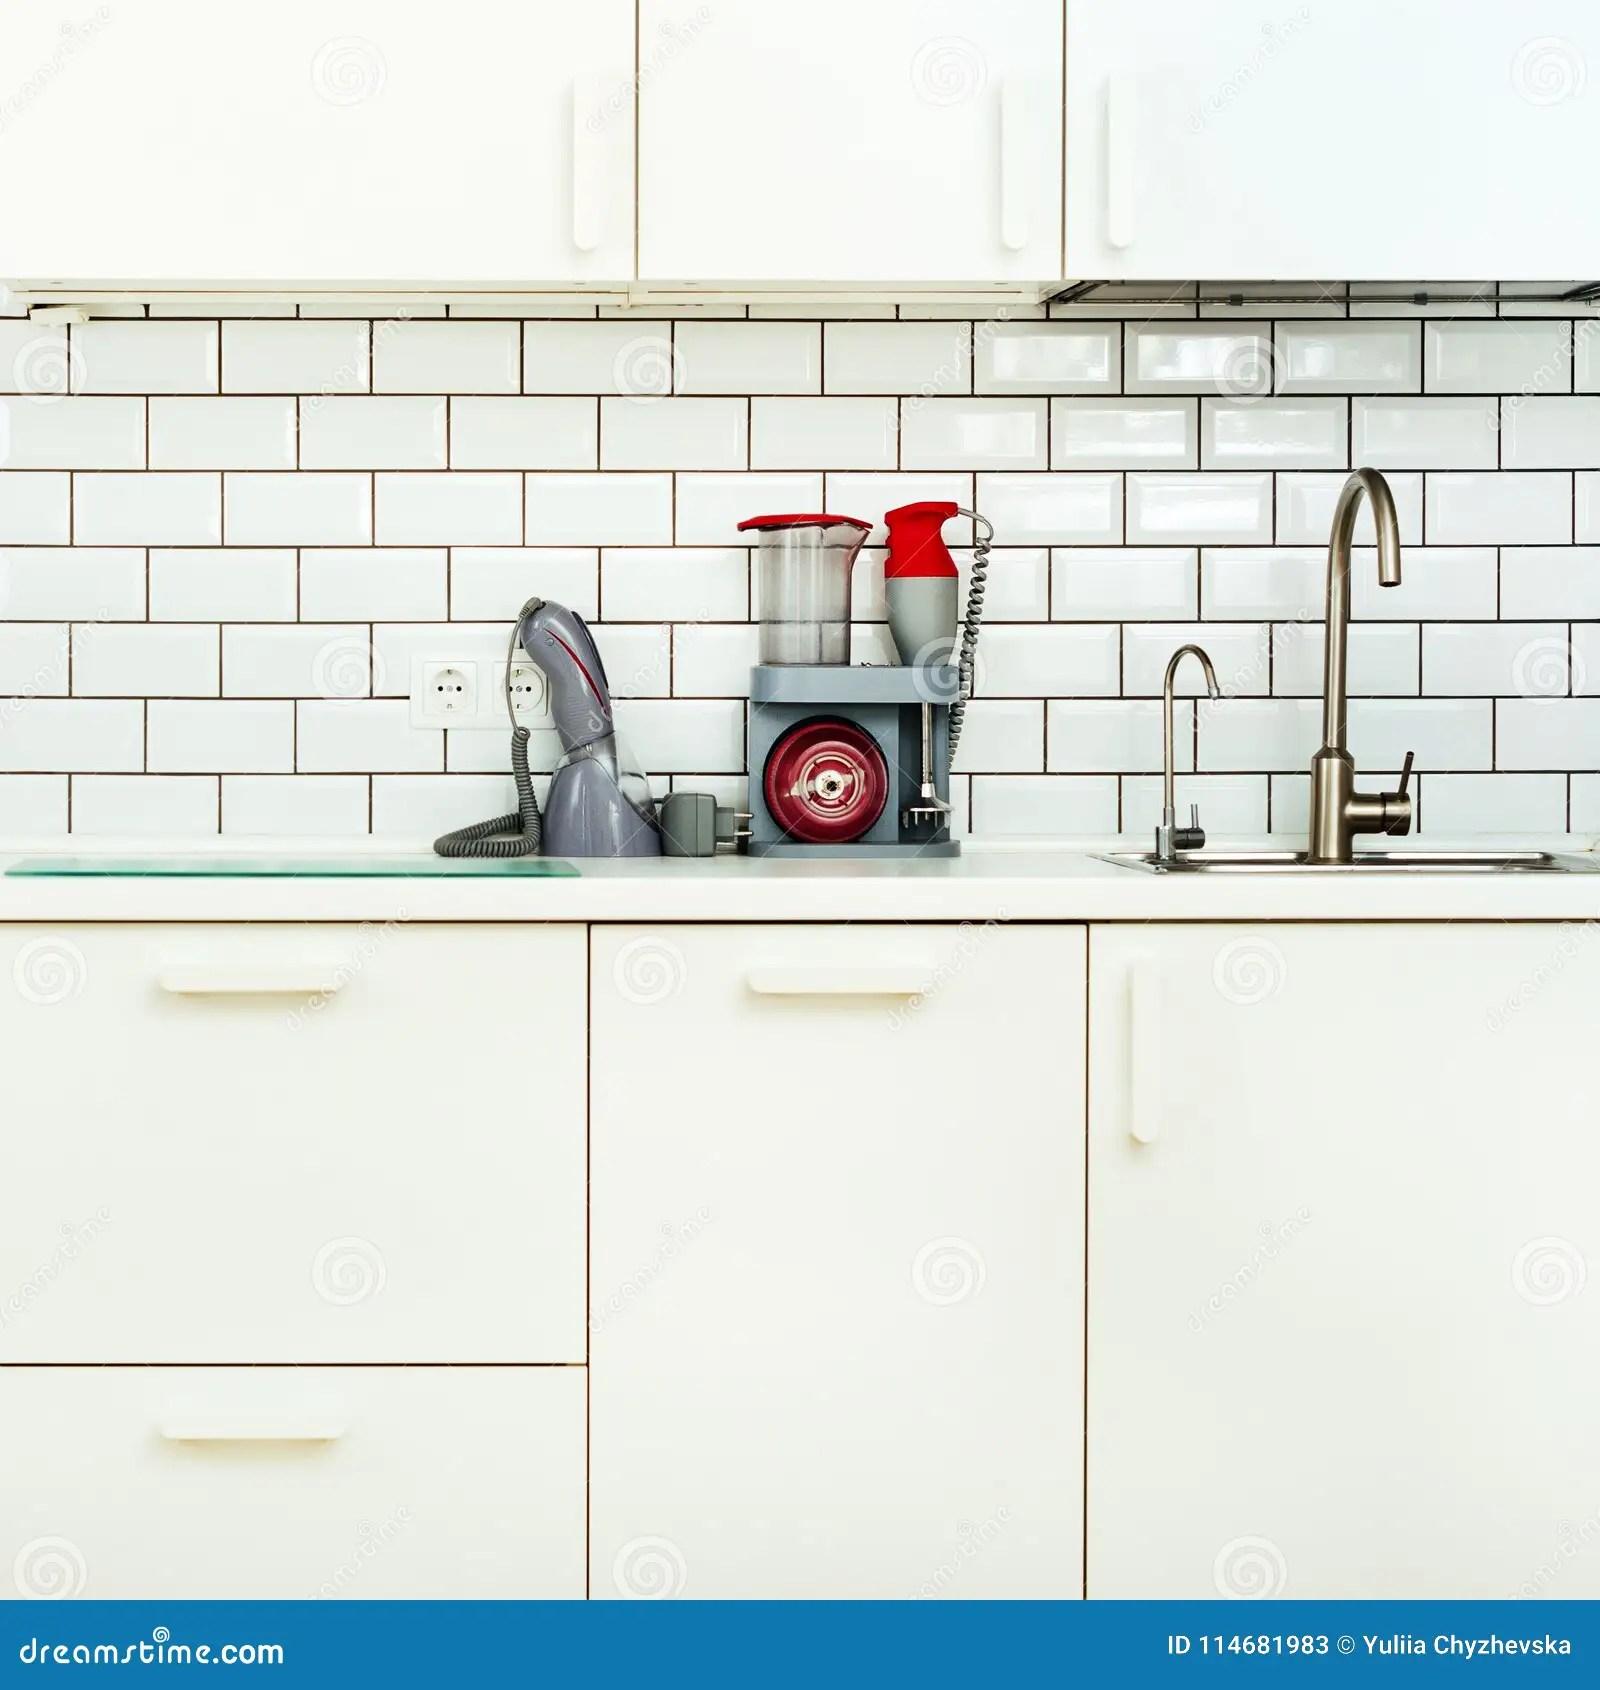 kitchen vacuum discount cabinets 白色minimalistic厨房内部和设计瓦片墙壁背景家用电器 搅拌器 真空机器 现代火炉 洗碗机 烤箱 桌 龙头搅拌器